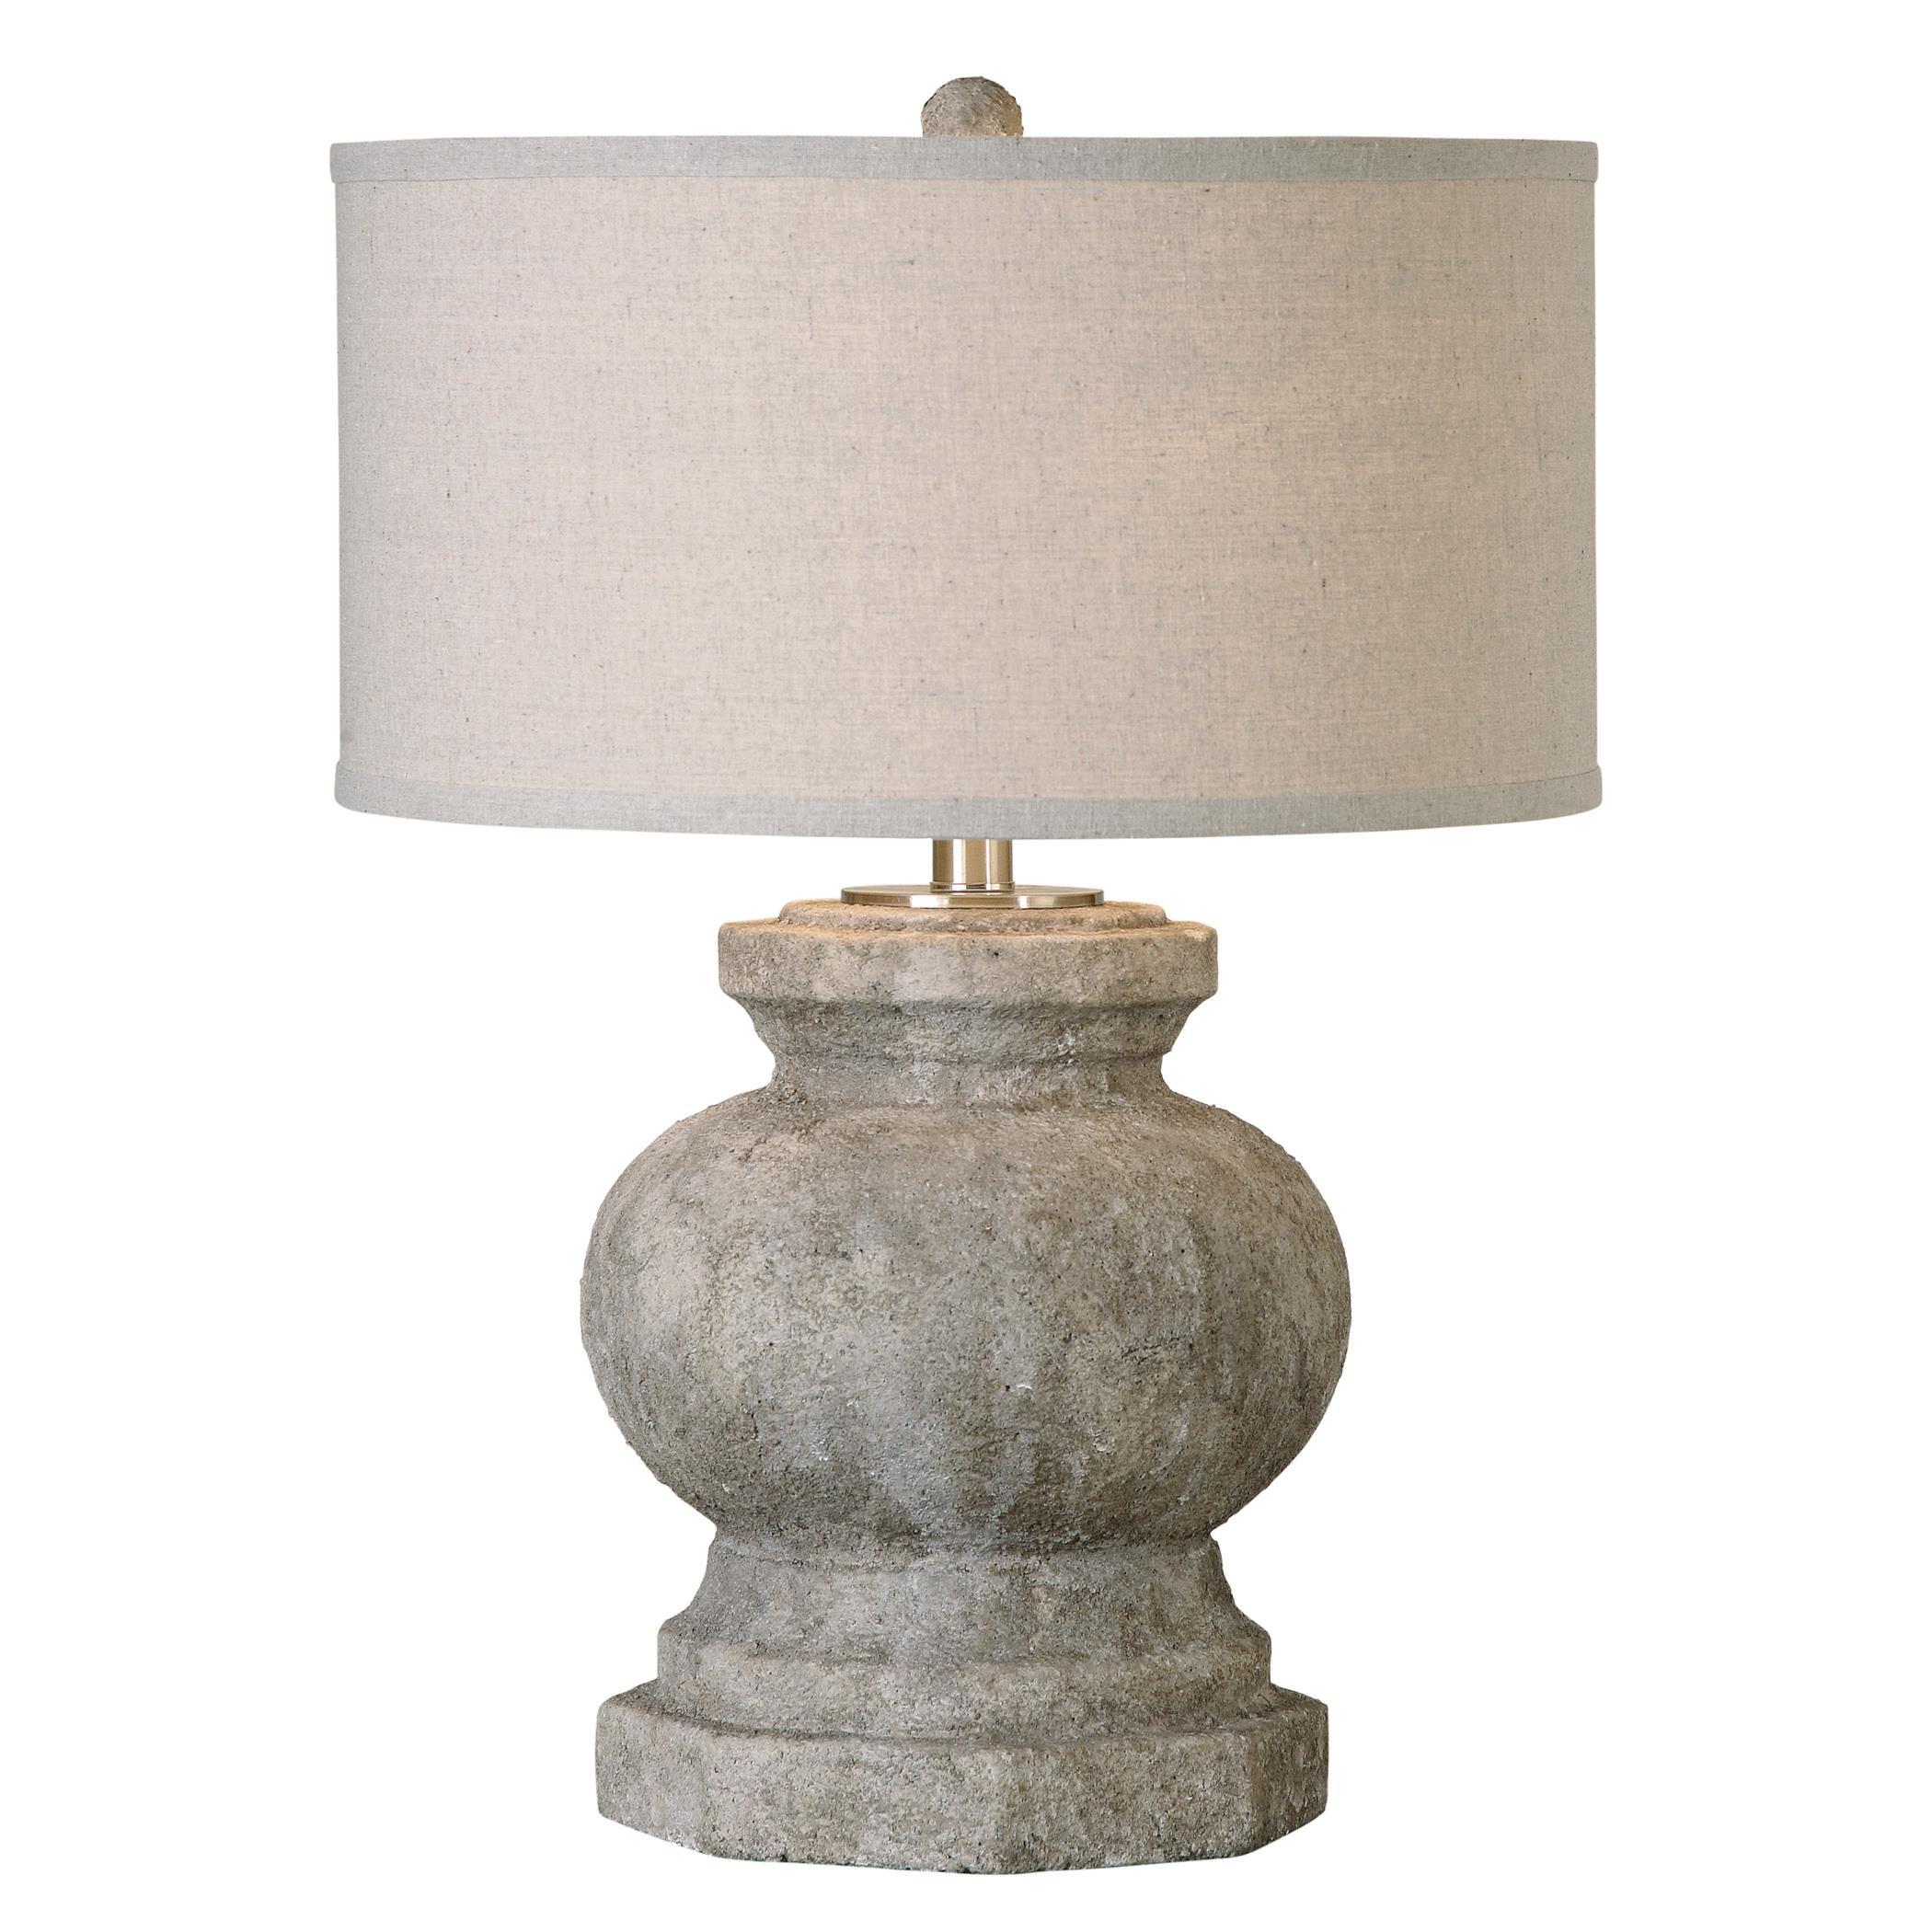 Verdello Antiqued Stone Table Lamp